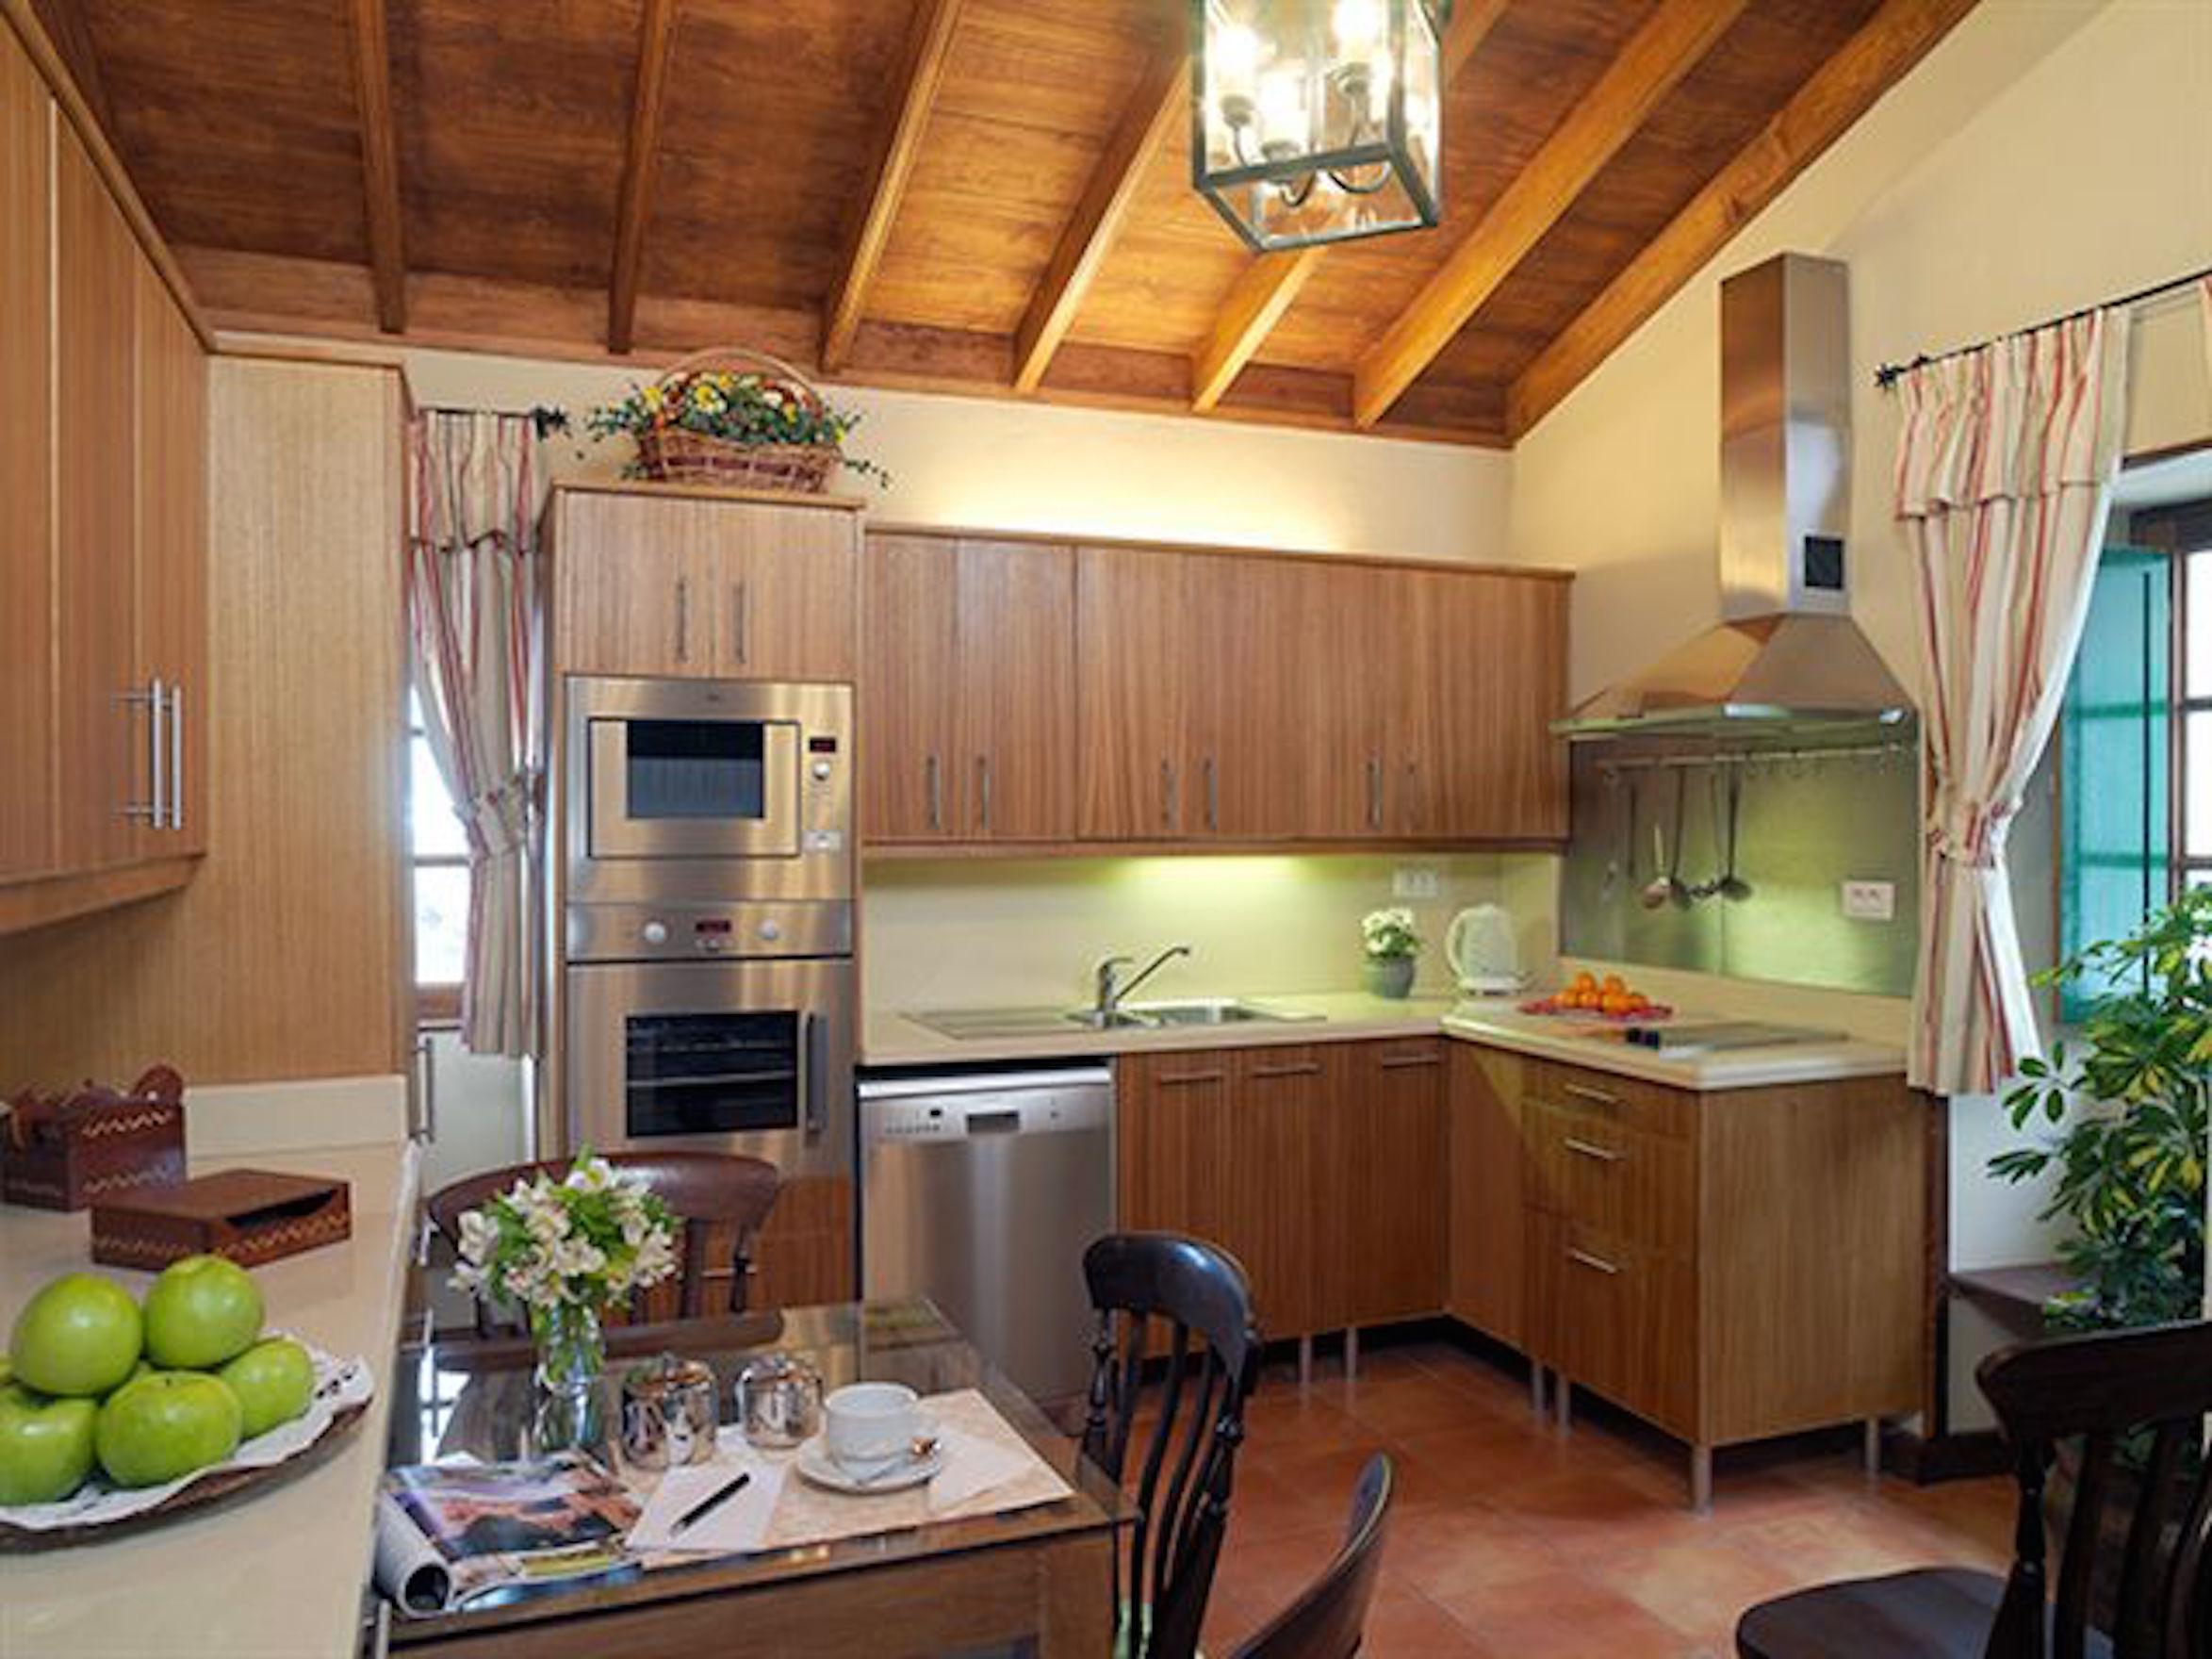 Maison de vacances La Hacienda, Free Wifi Grill (2196689), Garachico, Ténérife, Iles Canaries, Espagne, image 6